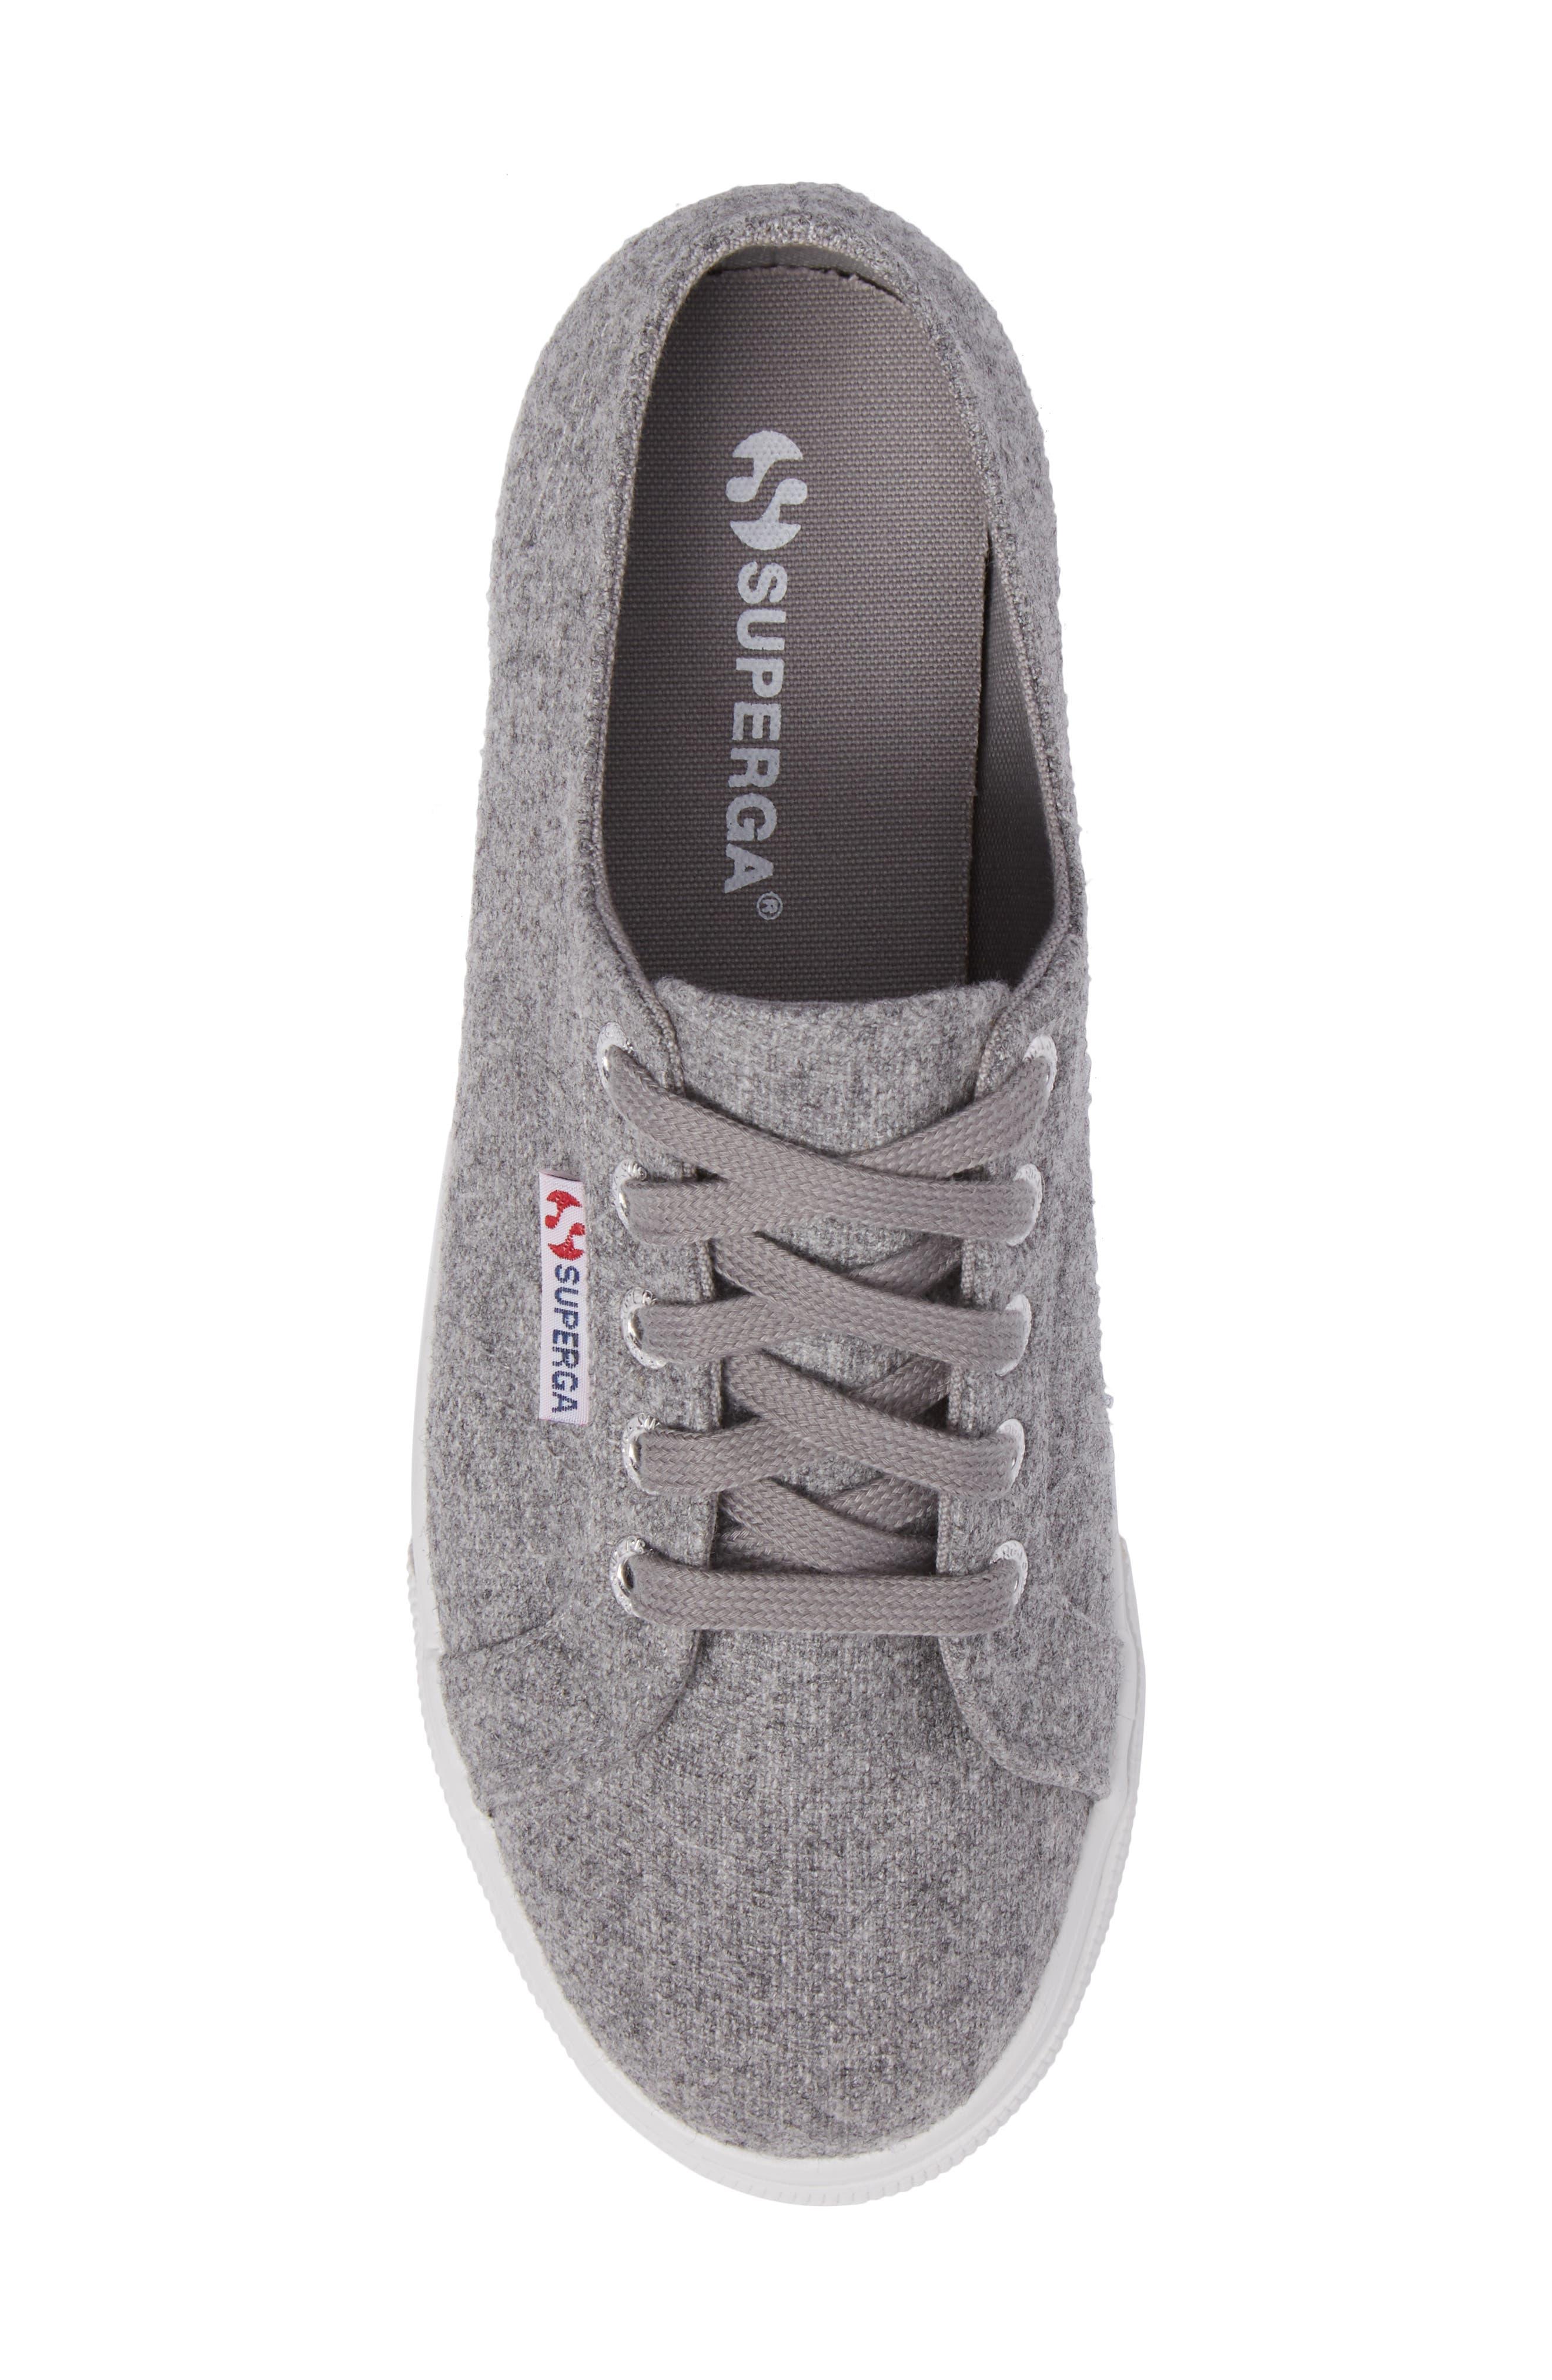 2790 Platform Sneaker,                             Alternate thumbnail 5, color,                             Light Grey Canvas